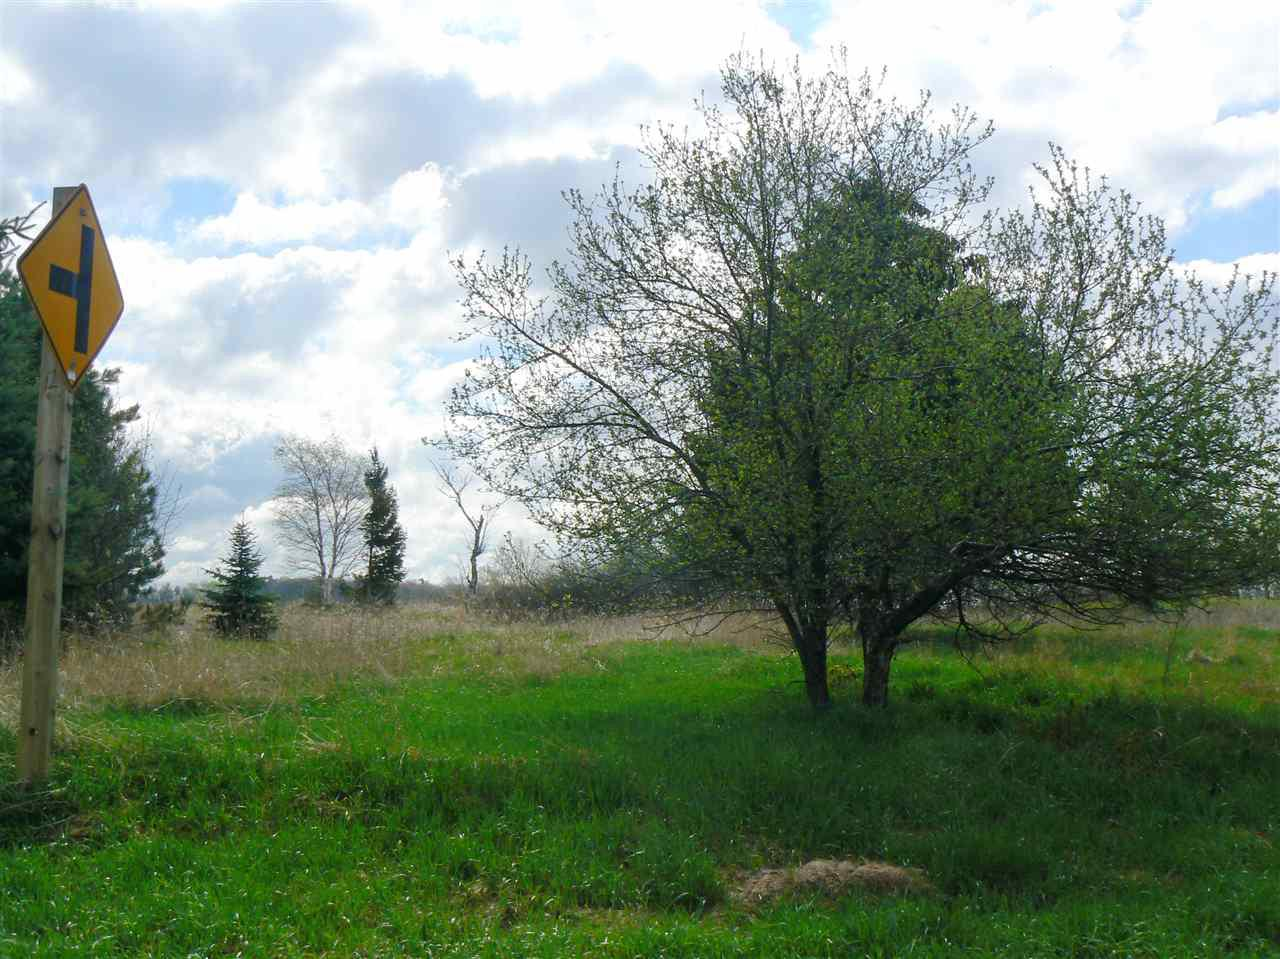 View Vacant Land For Sale at LEDGE CREST ROAD, De Pere, WI